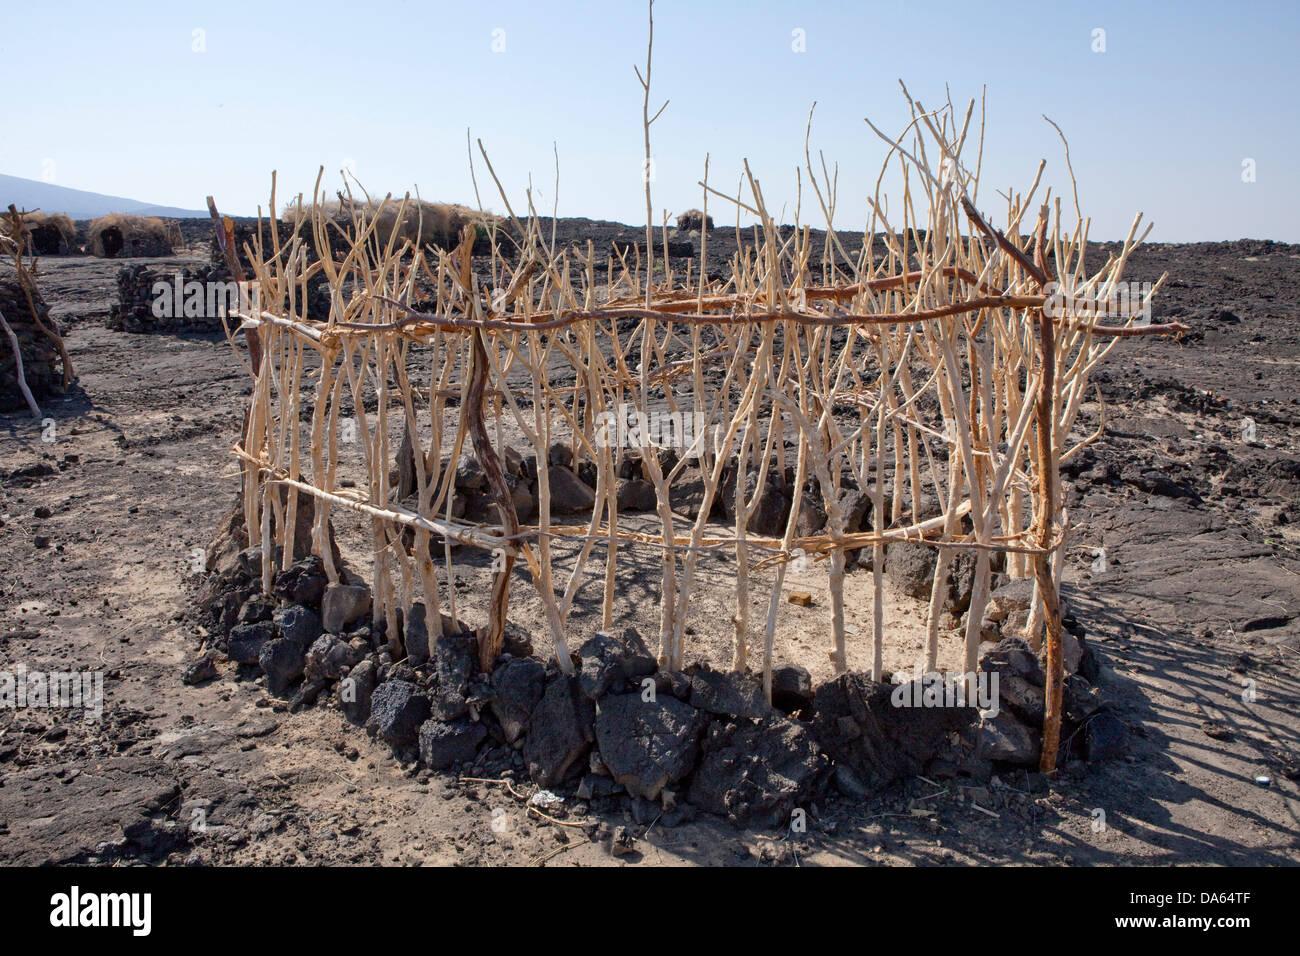 Building, house, hut, wooden hut, Danakil, Africa, Ethiopia, primitive - Stock Image